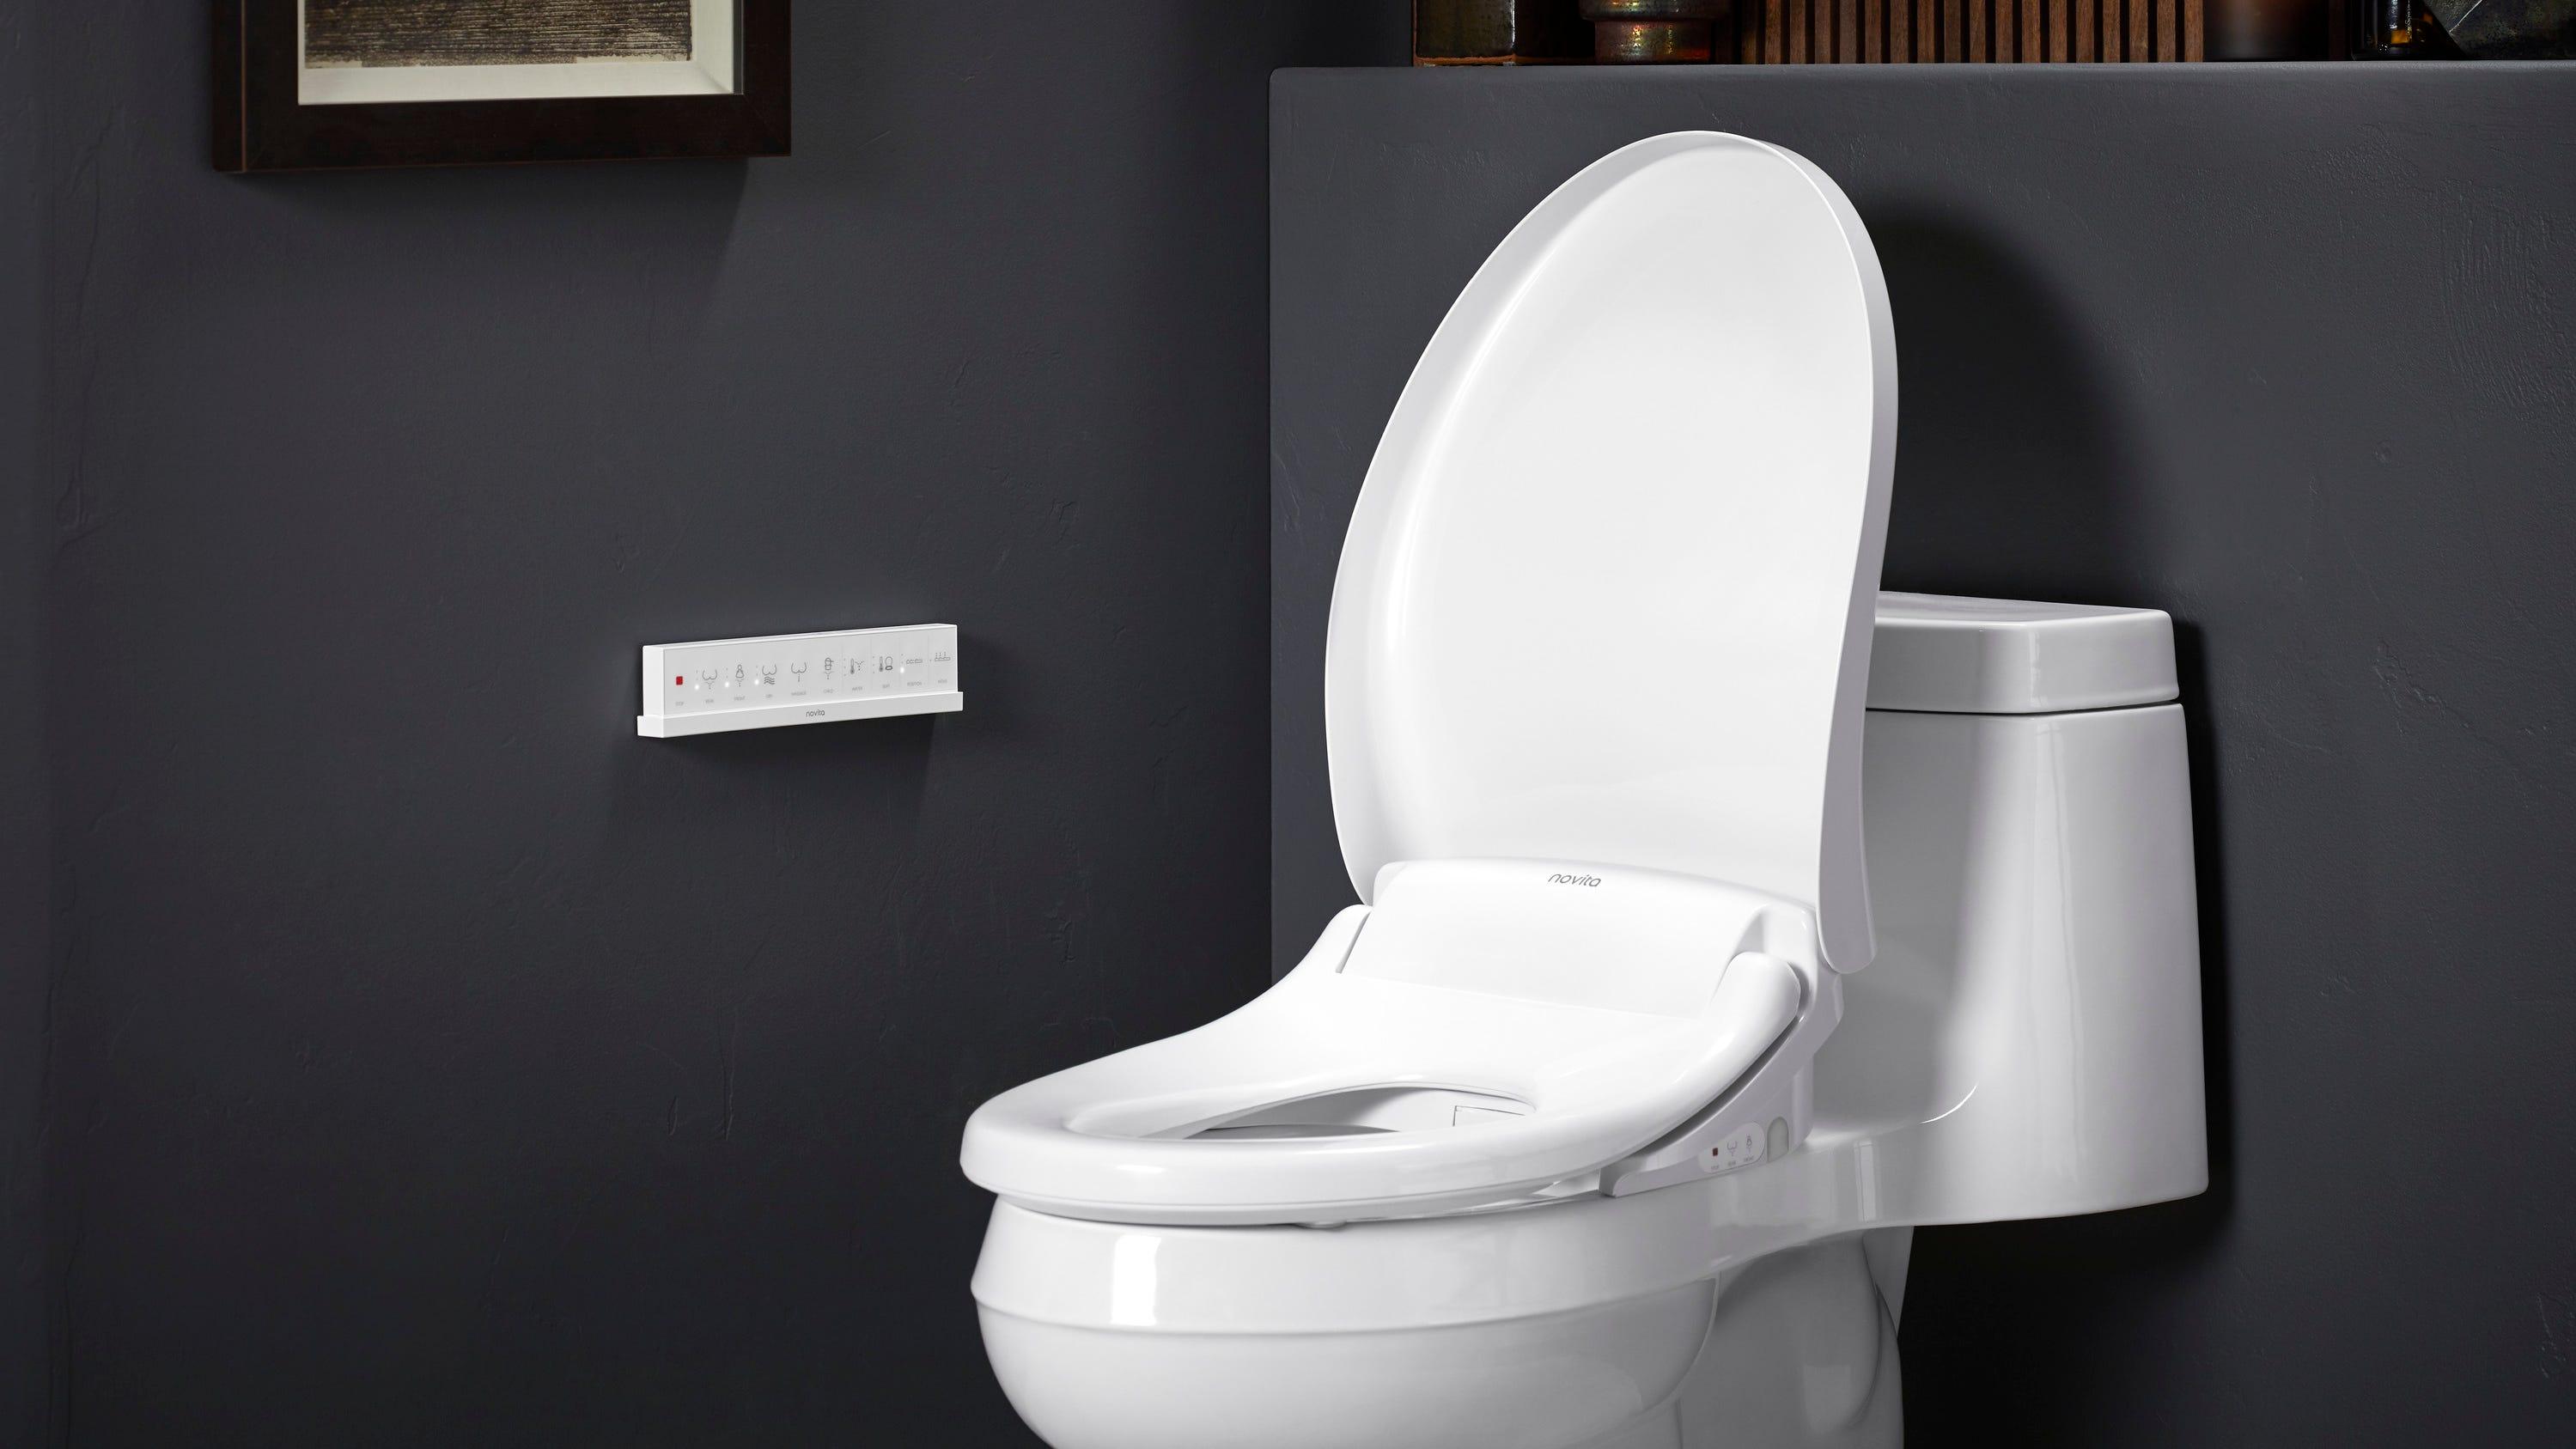 Toilet Paper Shortage Fears Driving Sales Of Bidets During Coronavirus